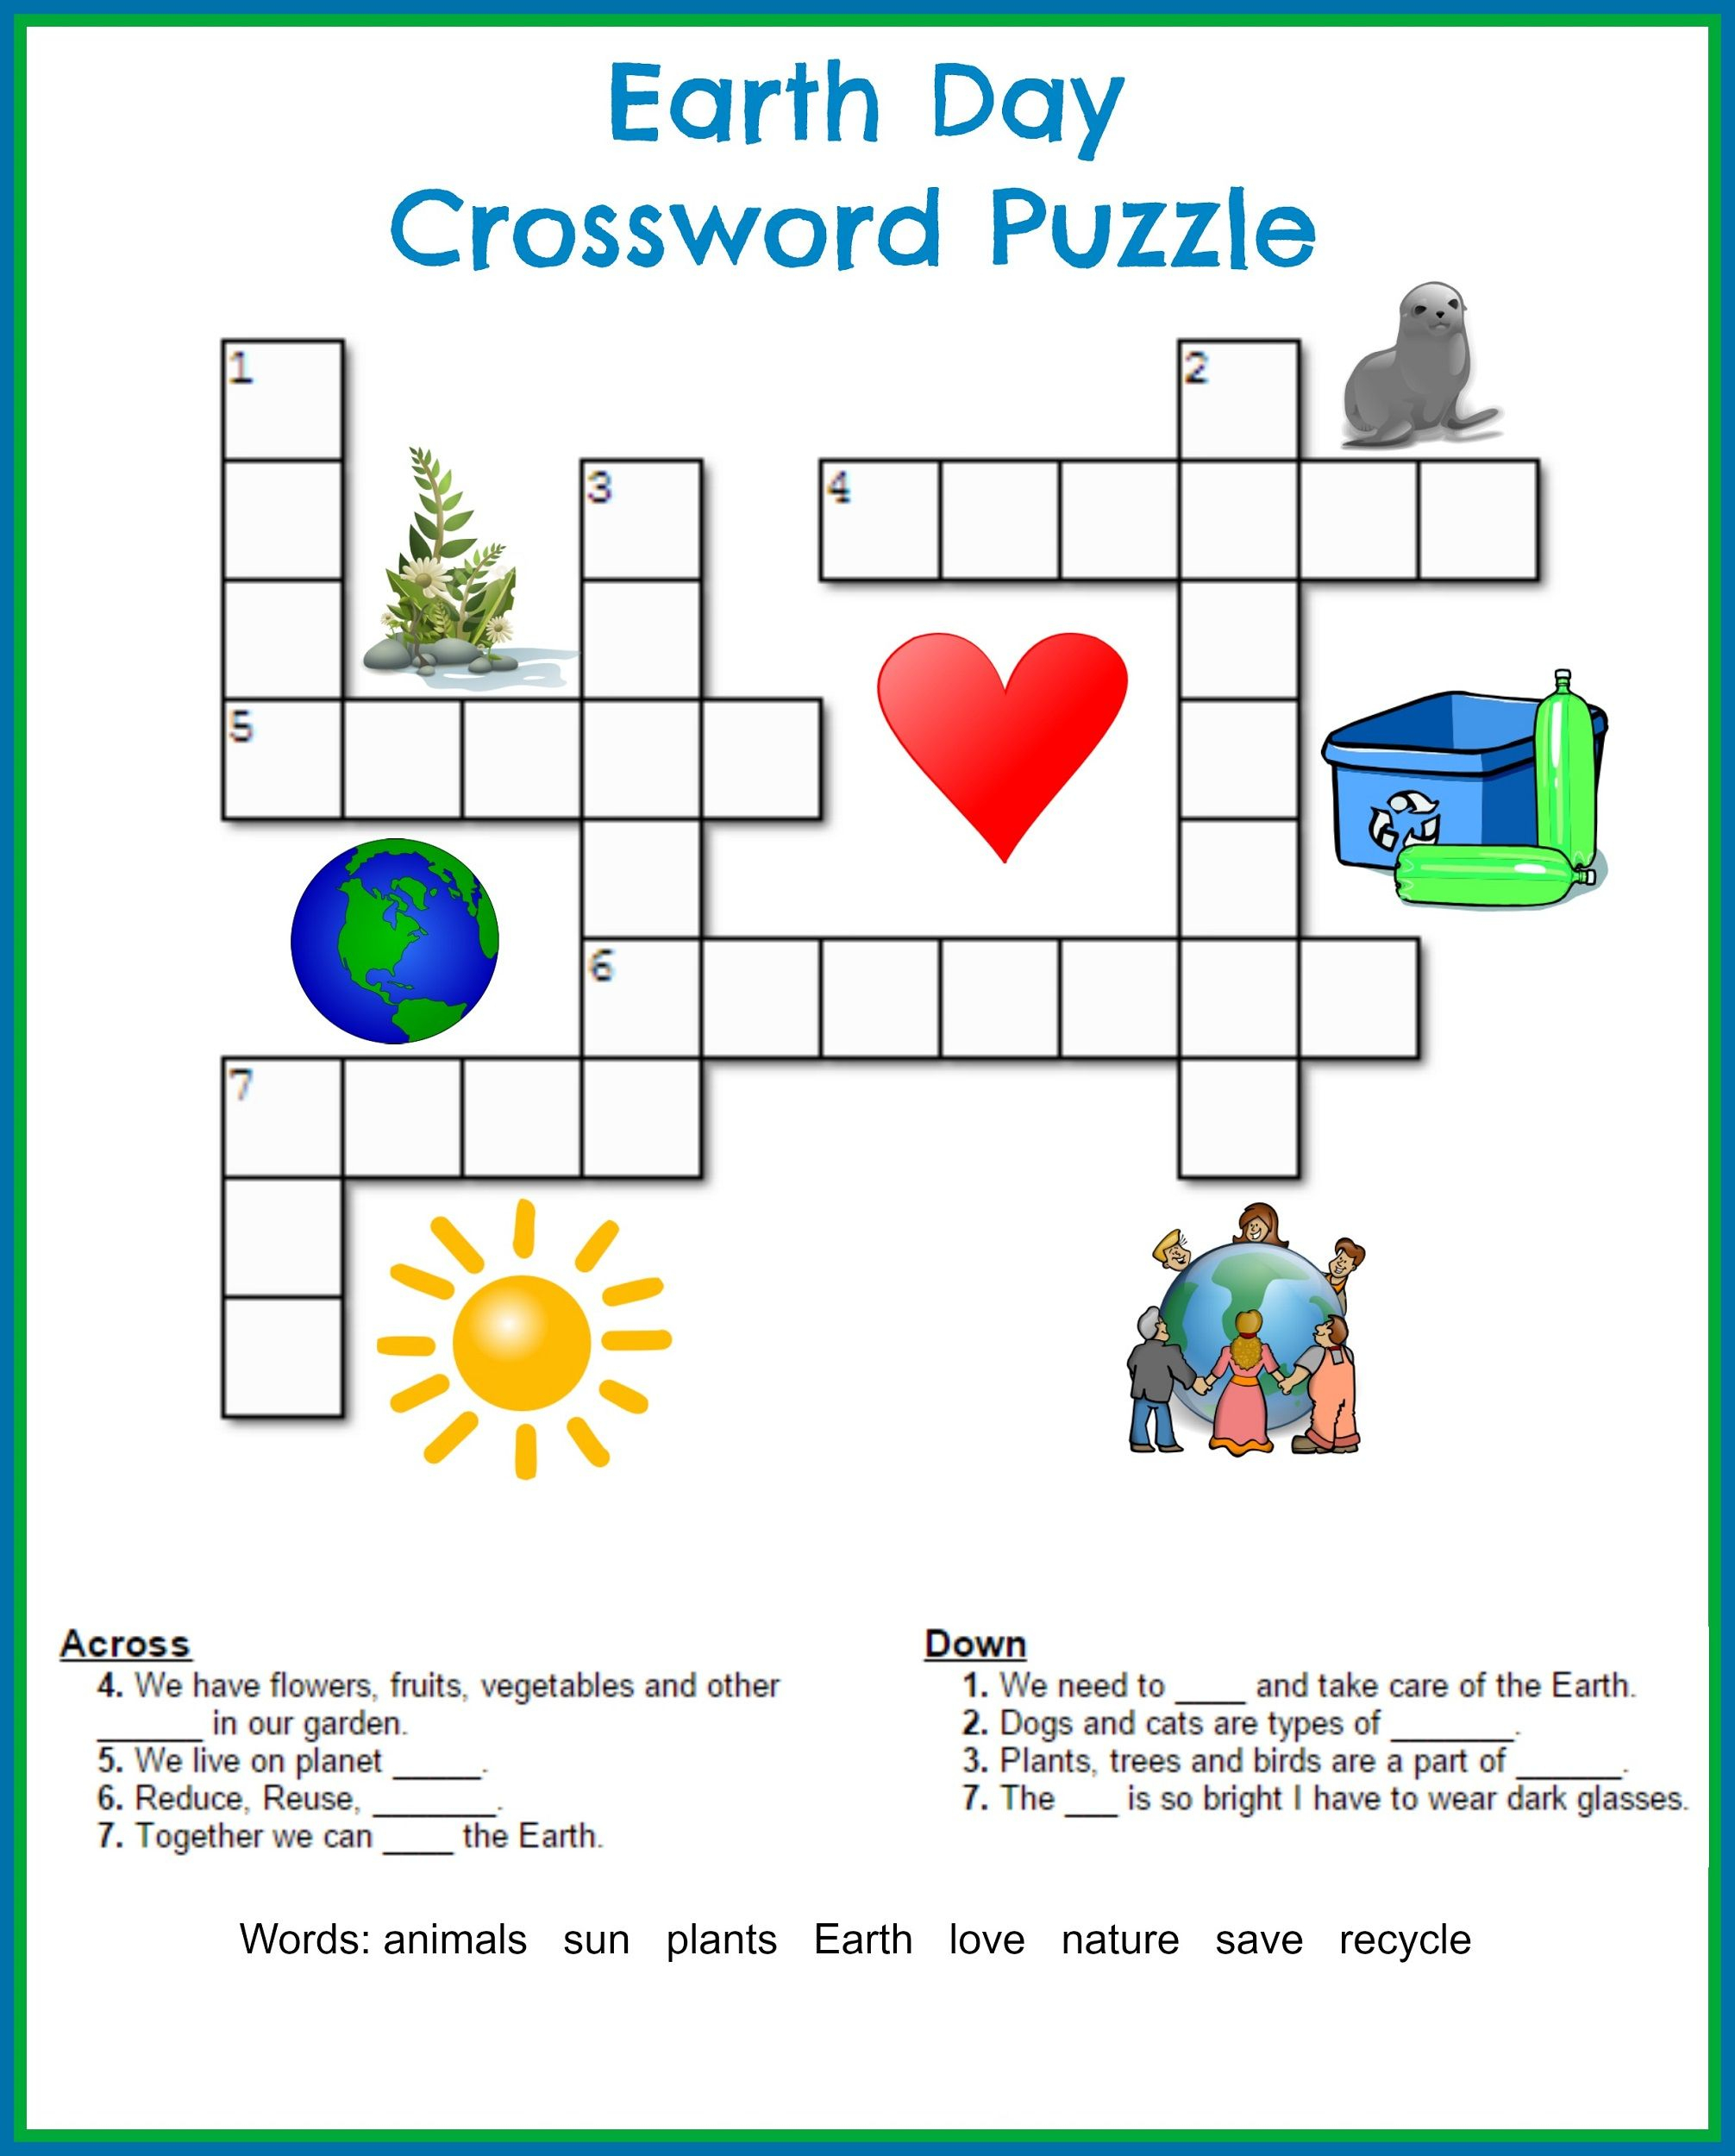 Printable Crossword Puzzles Kids   Crossword Puzzles On Earth - Printable Crossword Puzzle For Grade 2